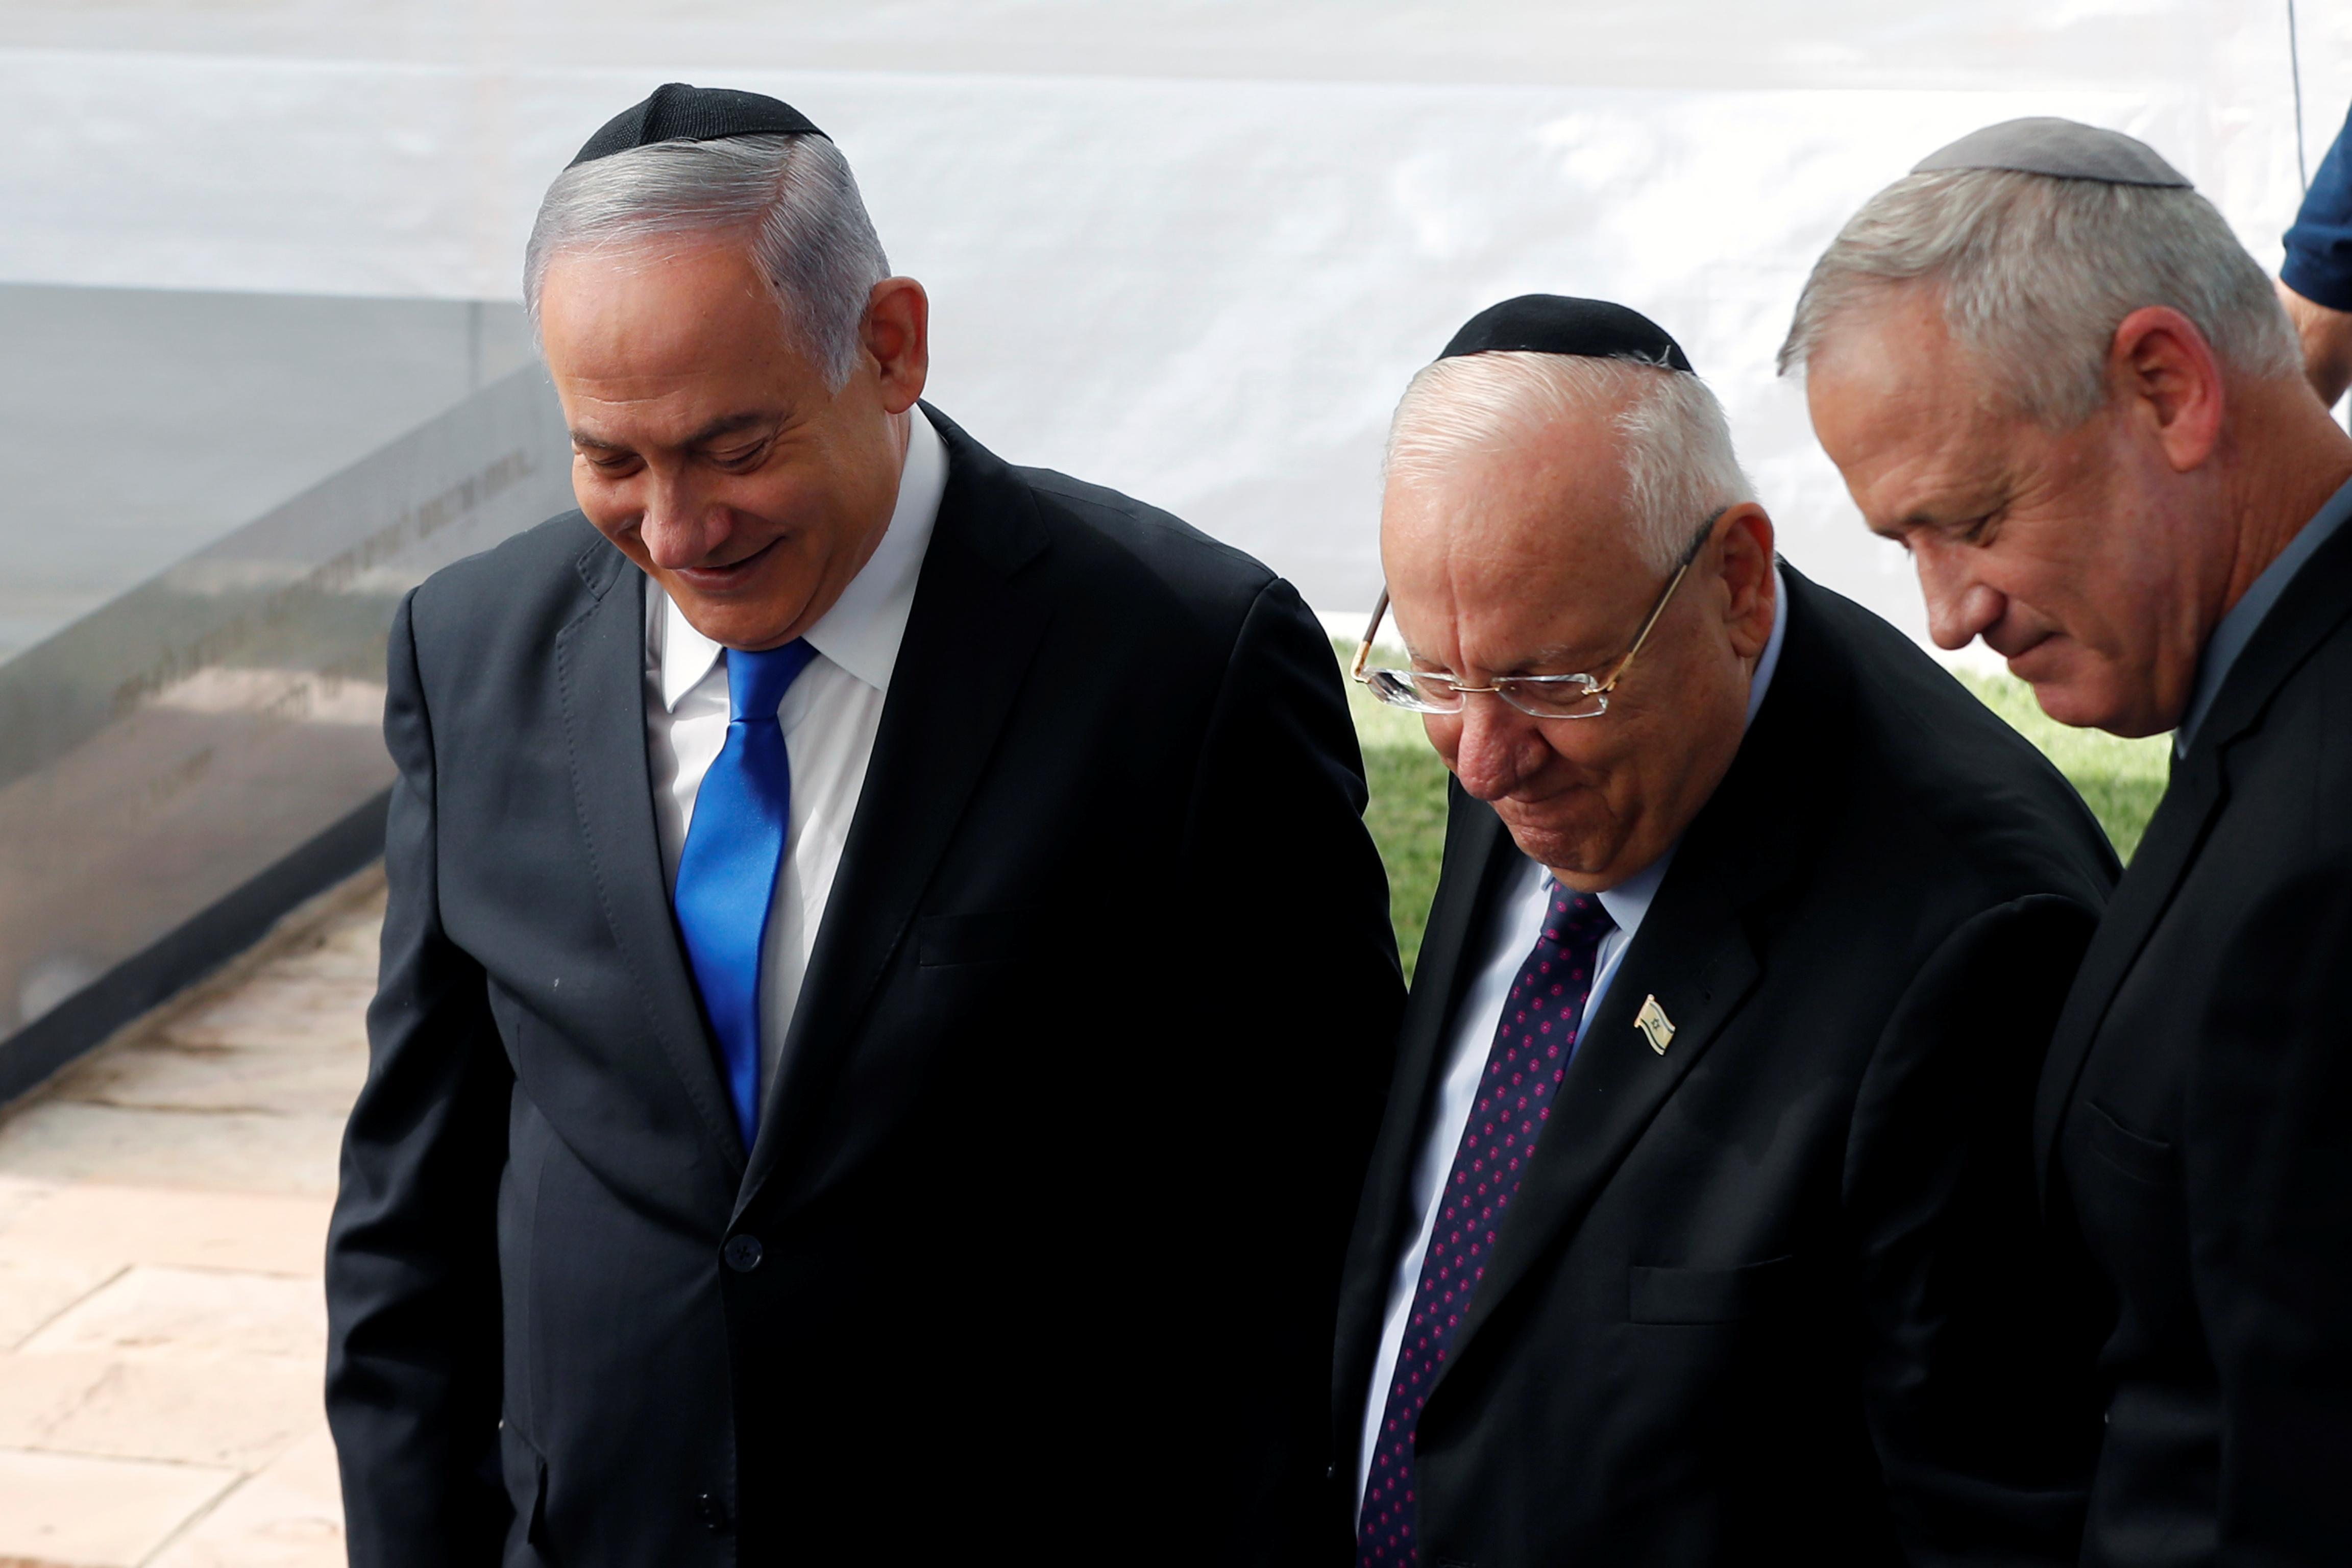 Weakened Netanyahu's offer of unity government rebuffed by rival Gantz